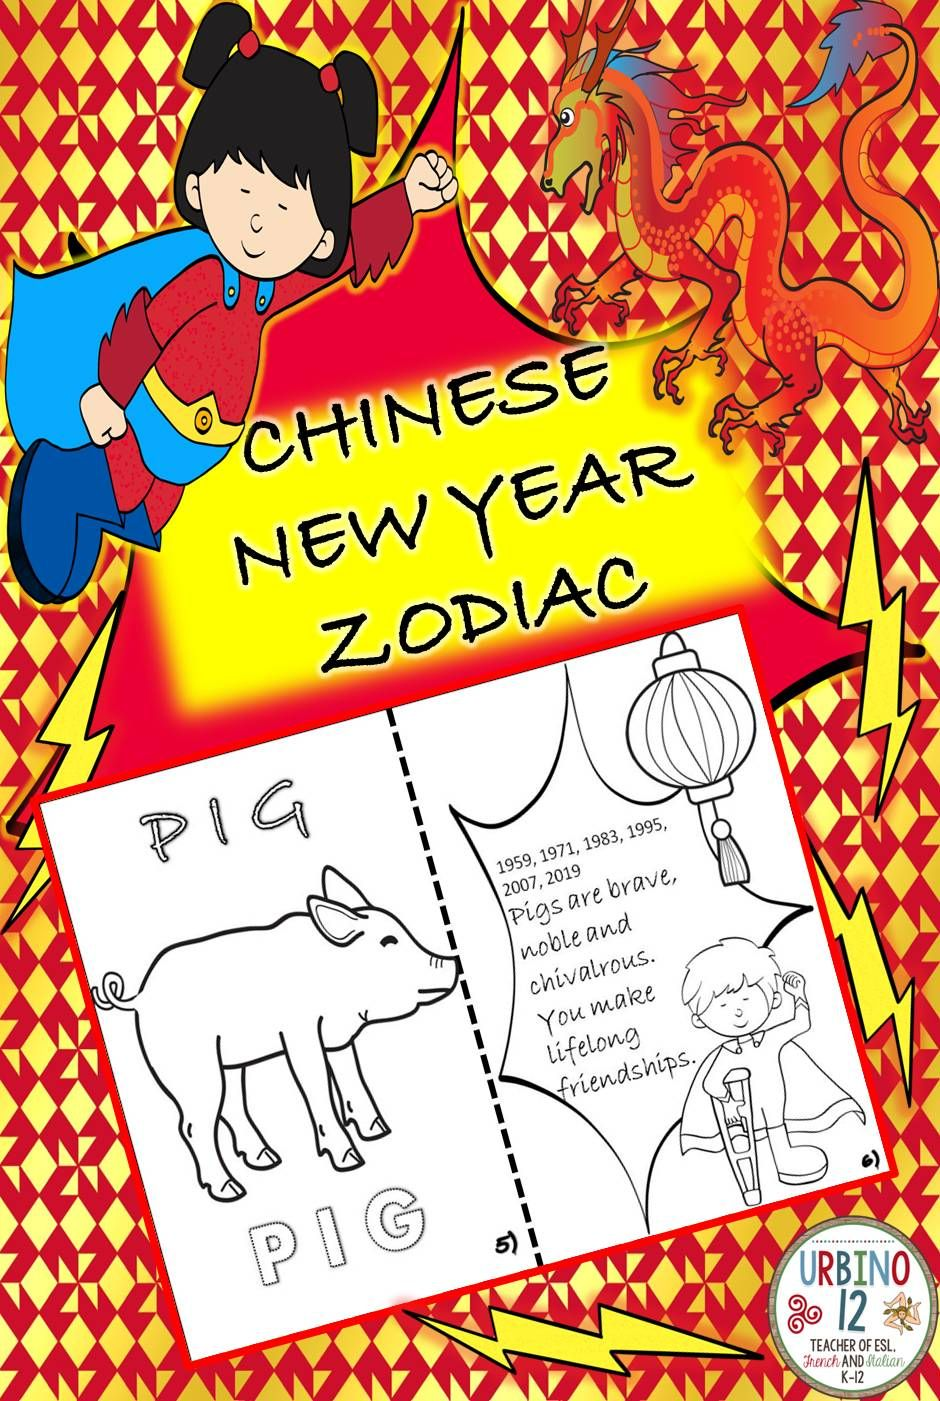 Chinese Zodiac Pig Pig chinese zodiac, Chinese zodiac